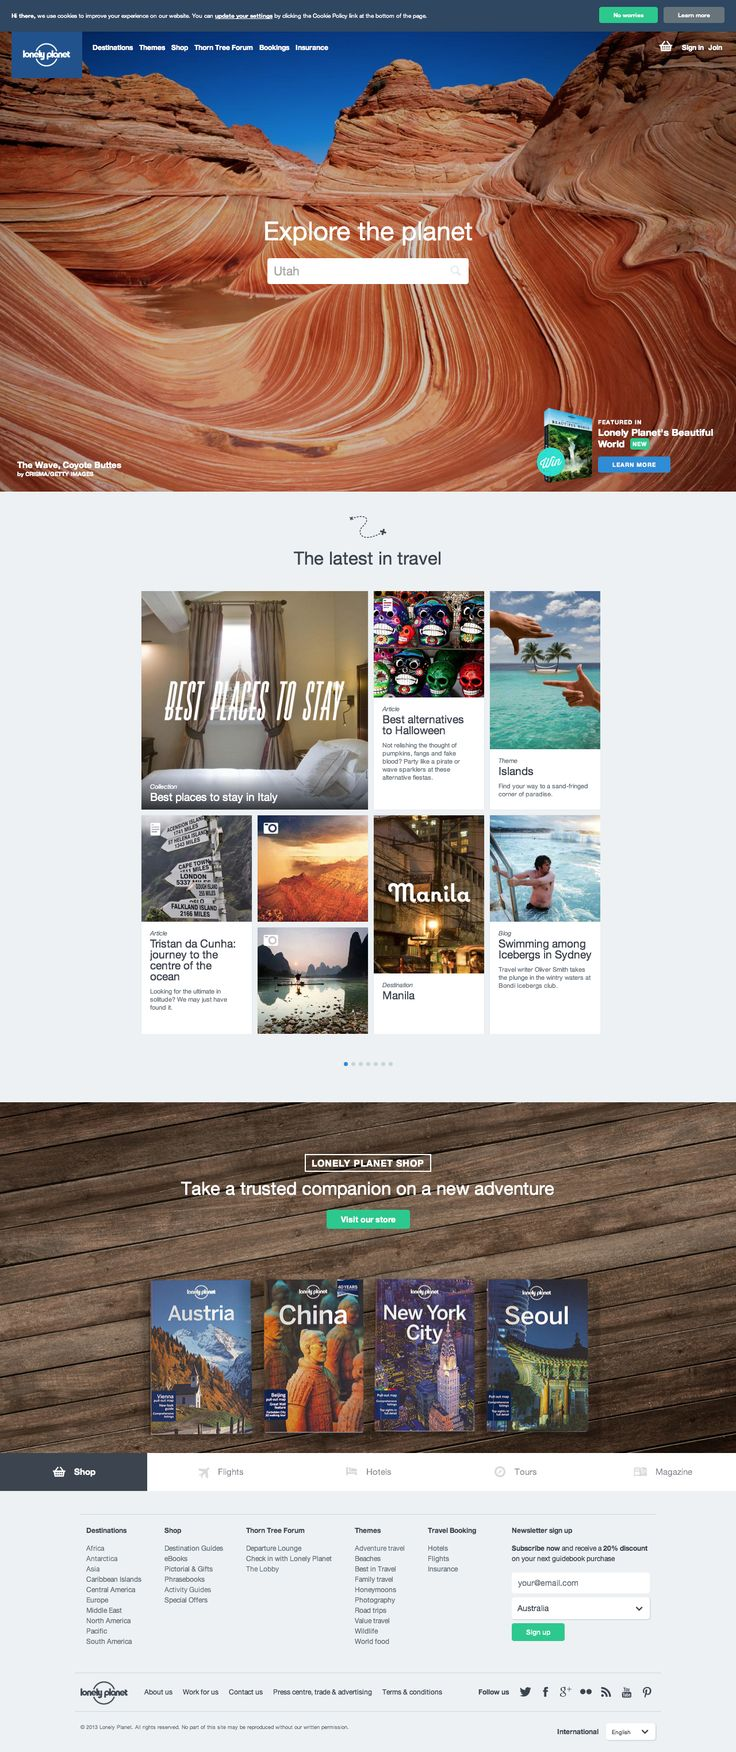 Lonelyplanet.com Website design #travel #website #grid